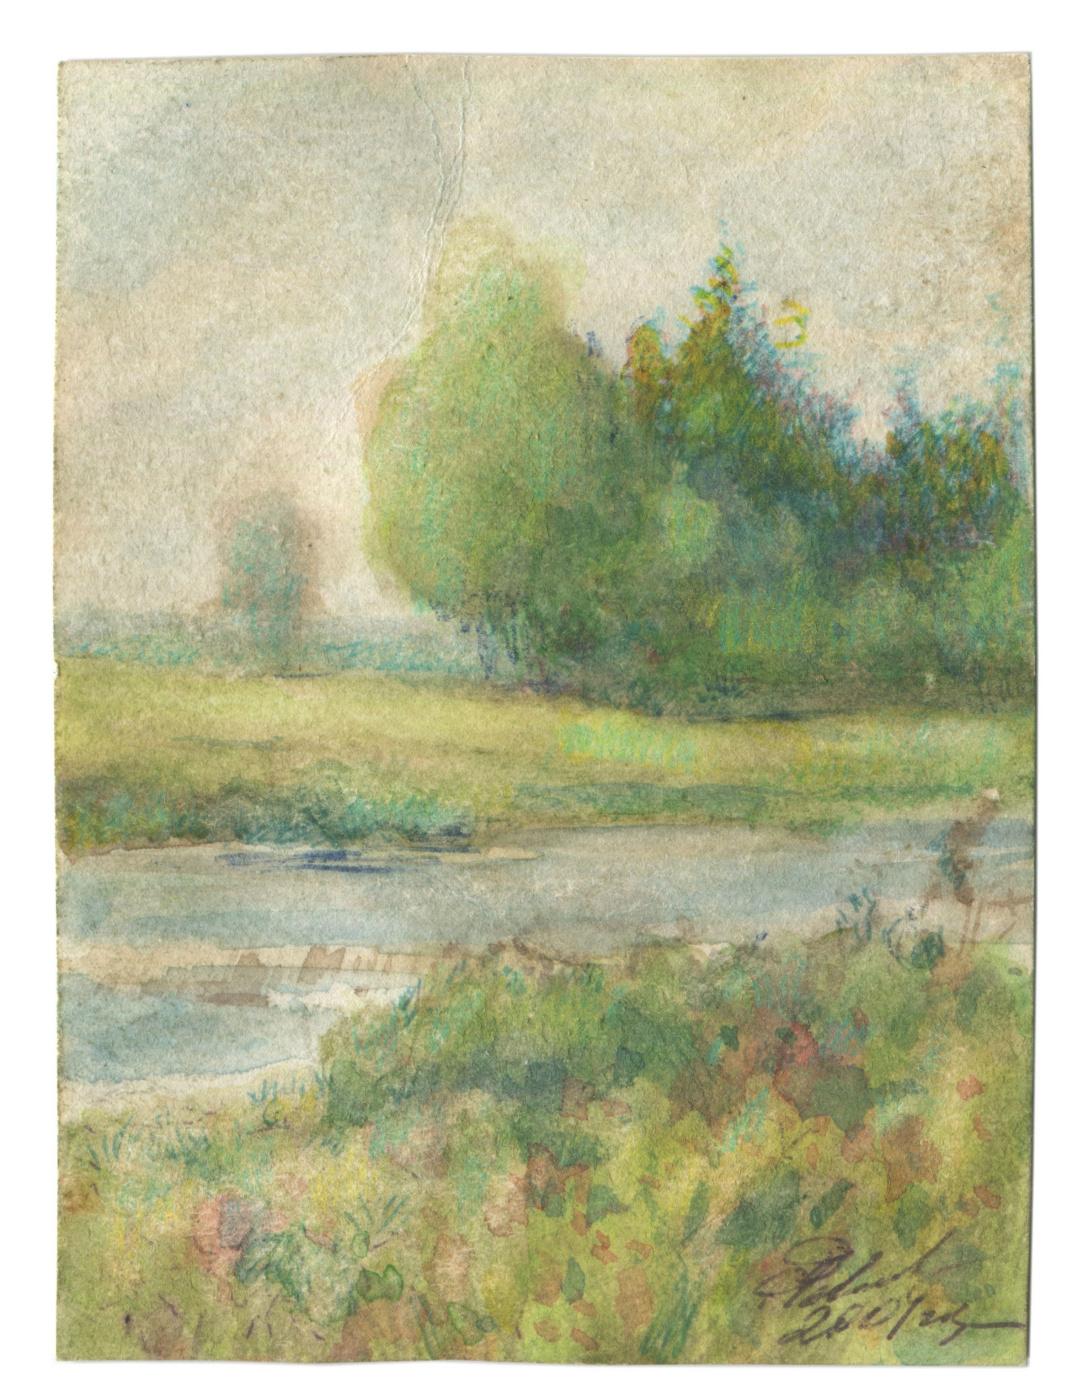 Alexandrovich Rudolf Pavlov. Landscape is a fantasy. I am 63 years old ... 2001.